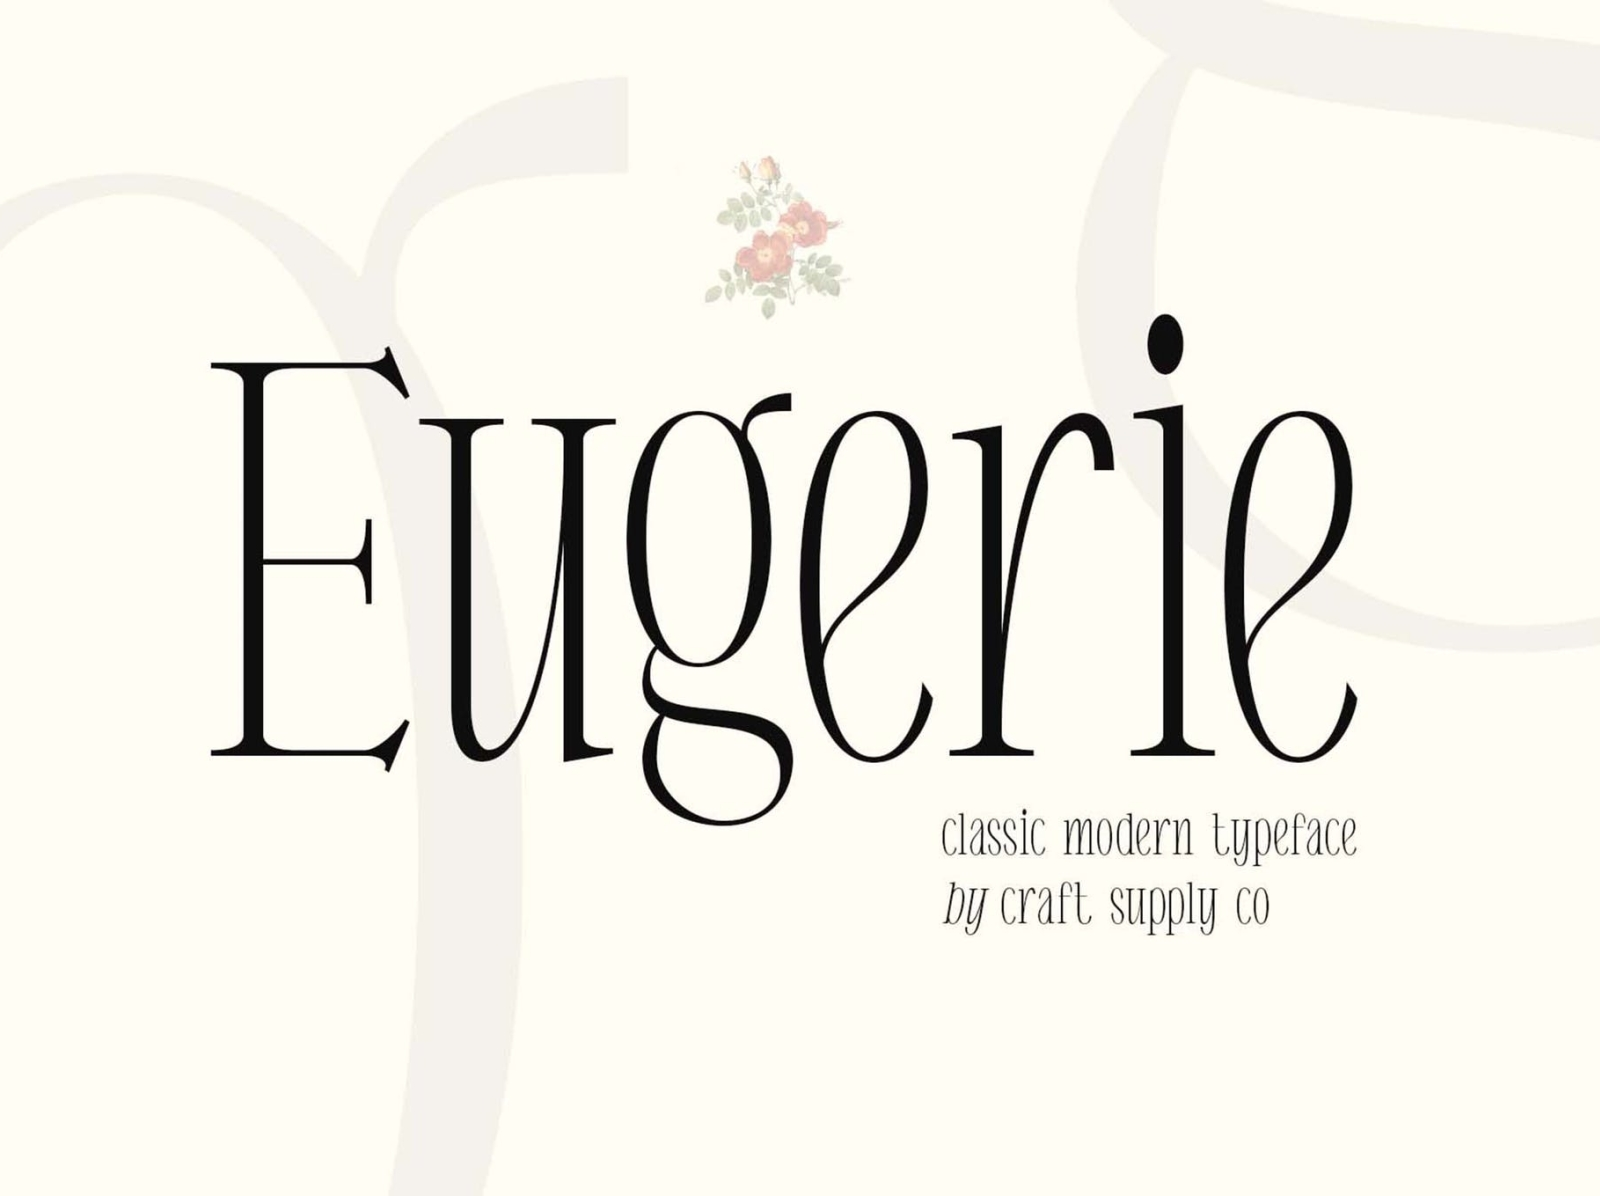 Eugerie - Classic Modern Typeface display modern classic typeface font ux vector ui logo app typography illustration graphic design design branding